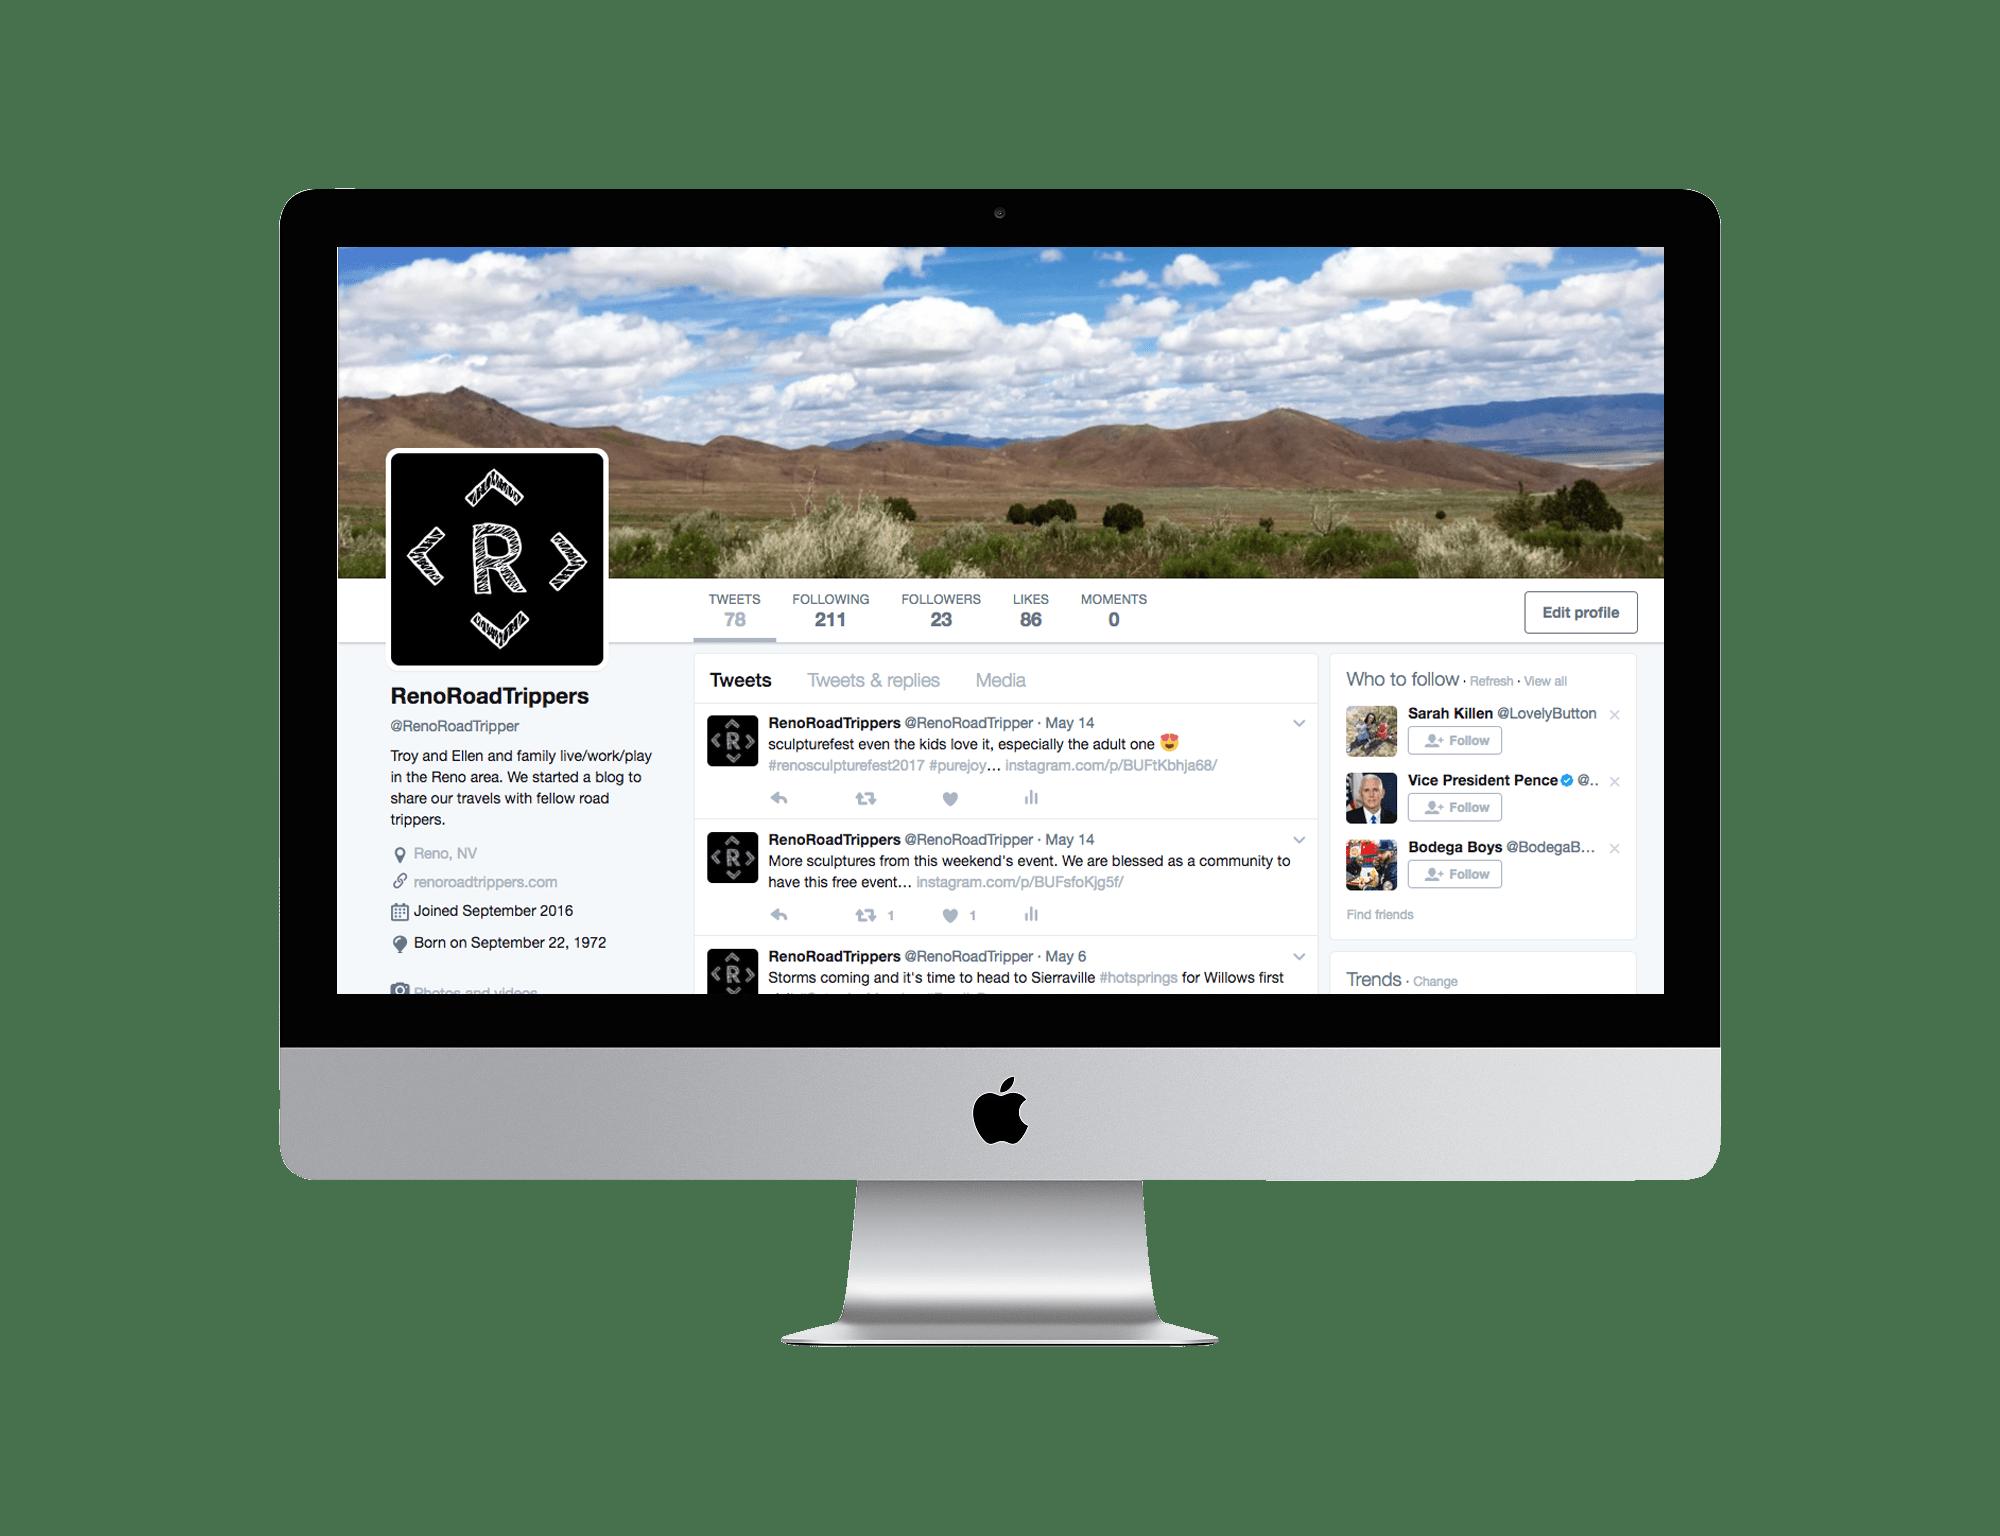 Reno Road Trippers Twitter